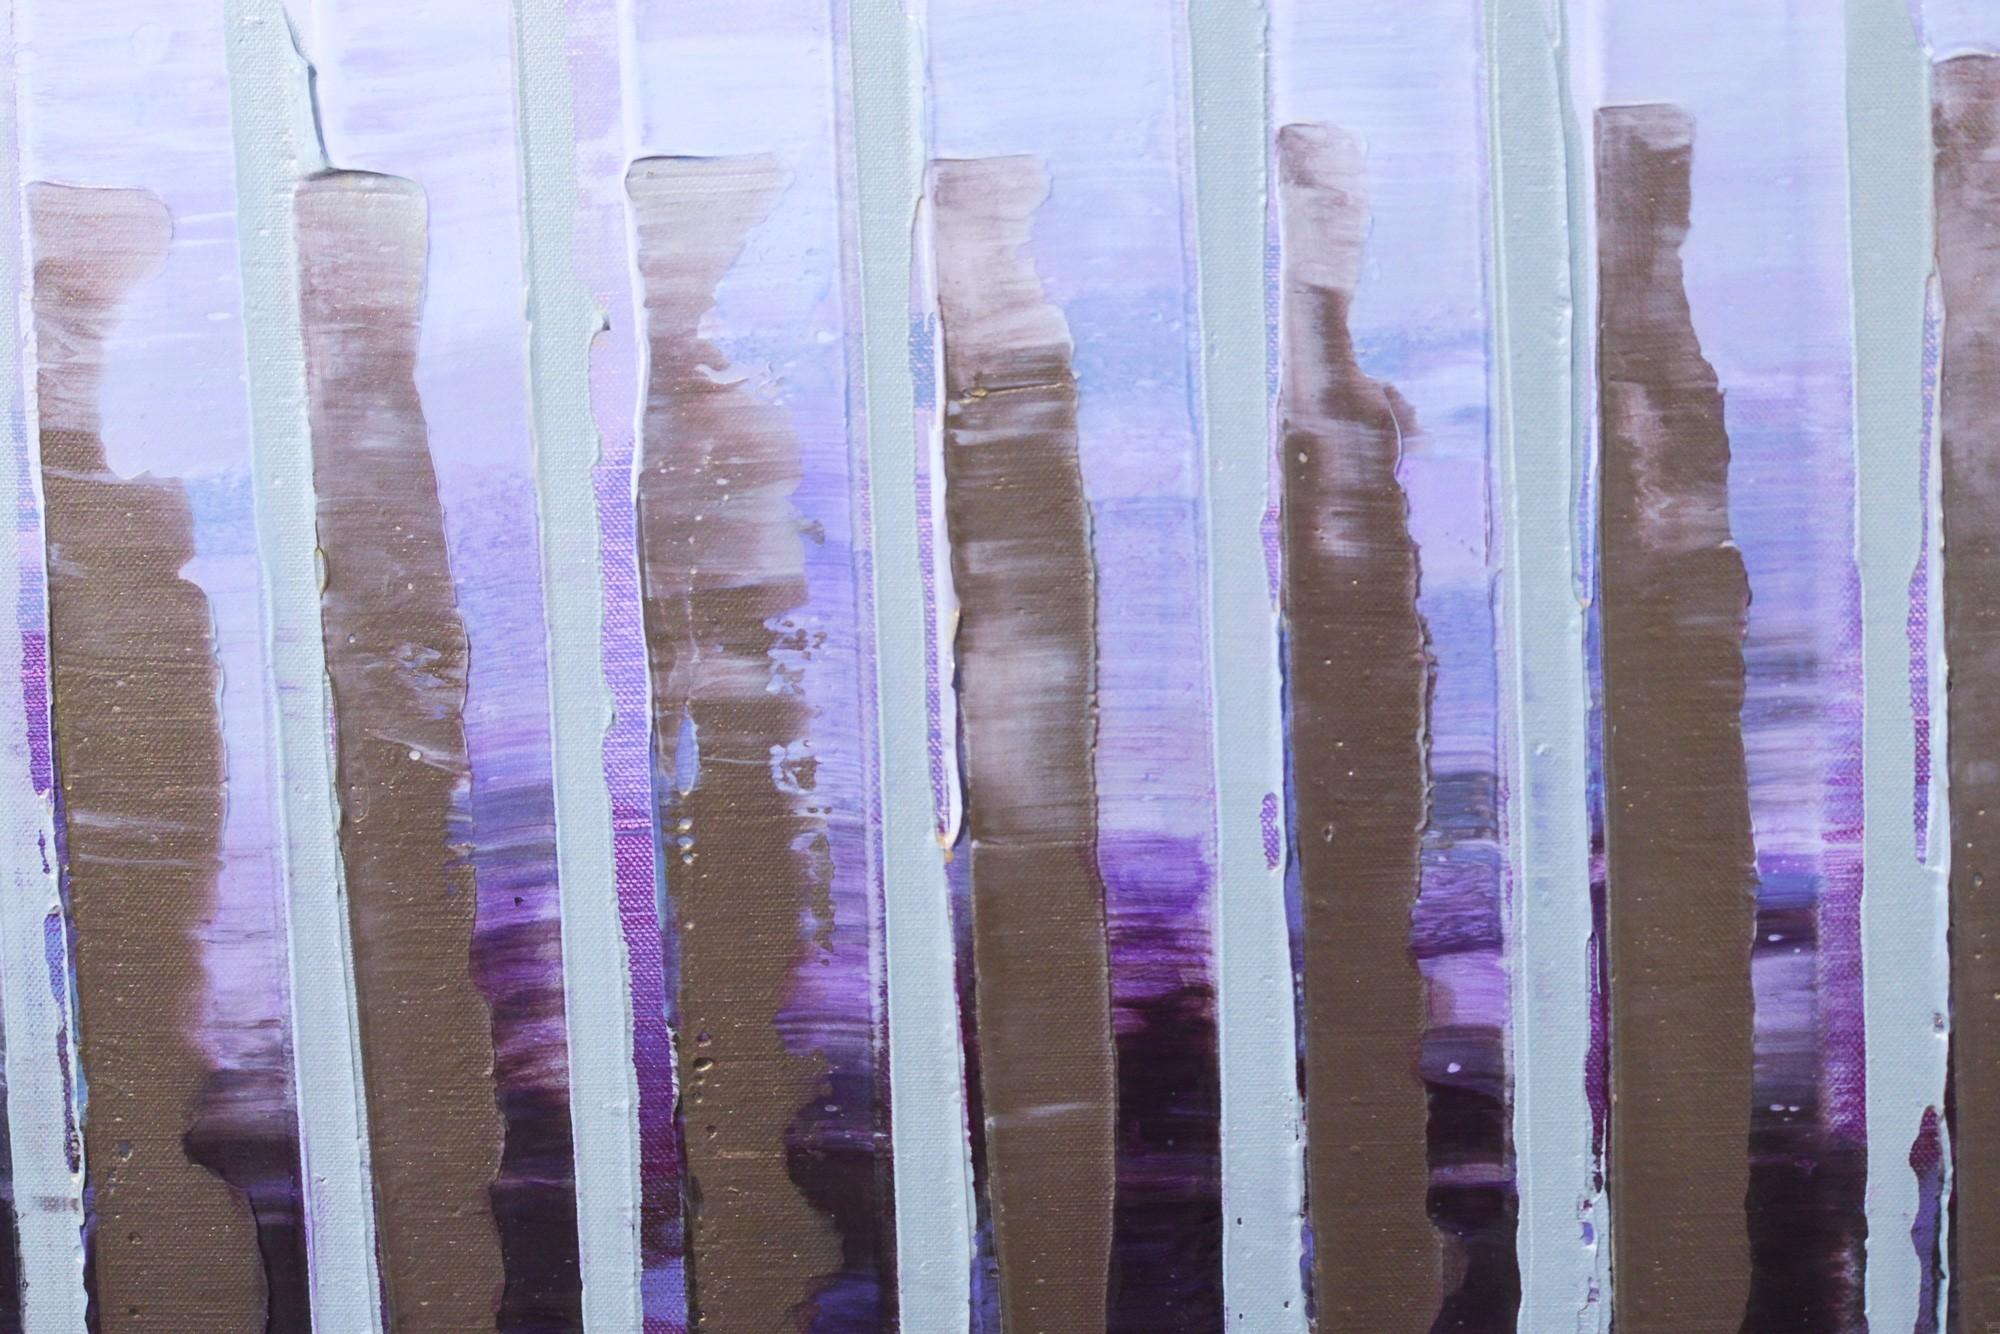 Pink November | Malerei von Lali Torma | Acryl auf Leinwand, abstrakt, Detail 1